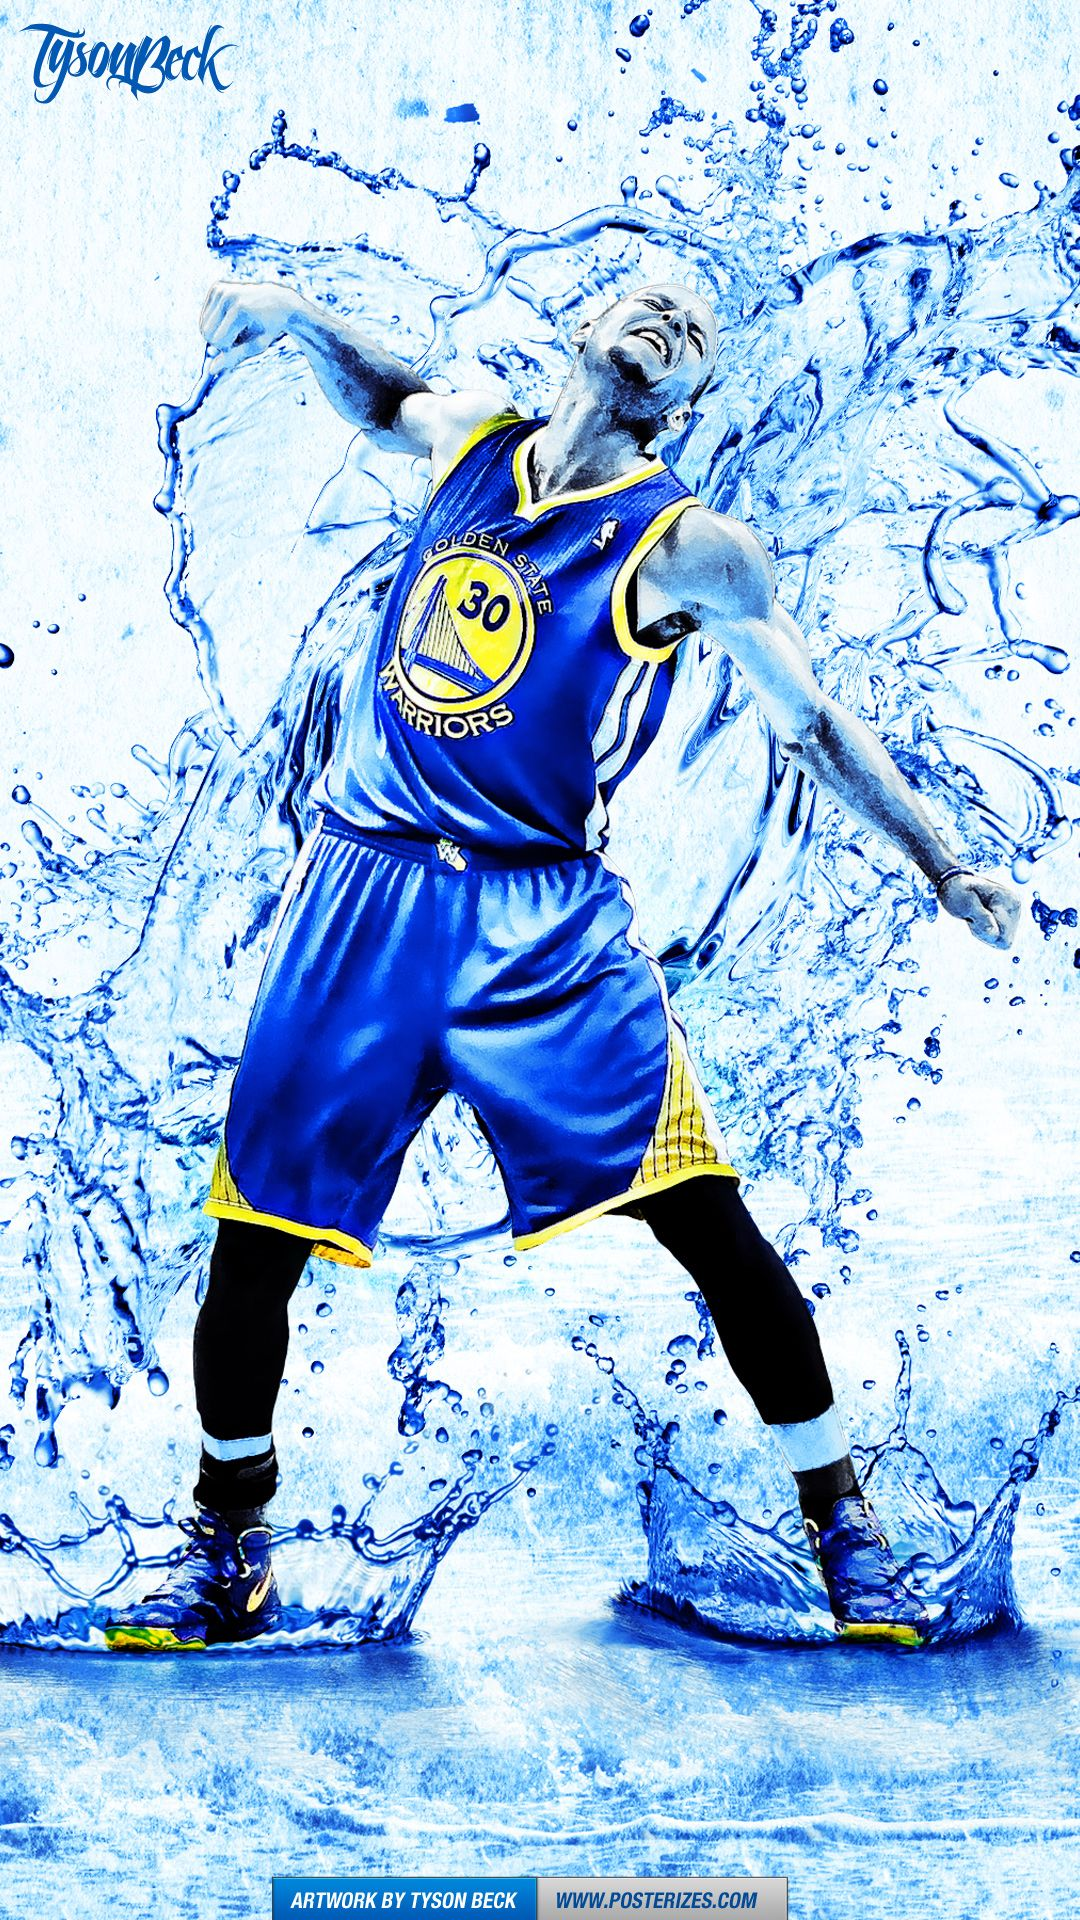 Stephen Curry Splash Wallpaper Posterizes Nba Wallpapers